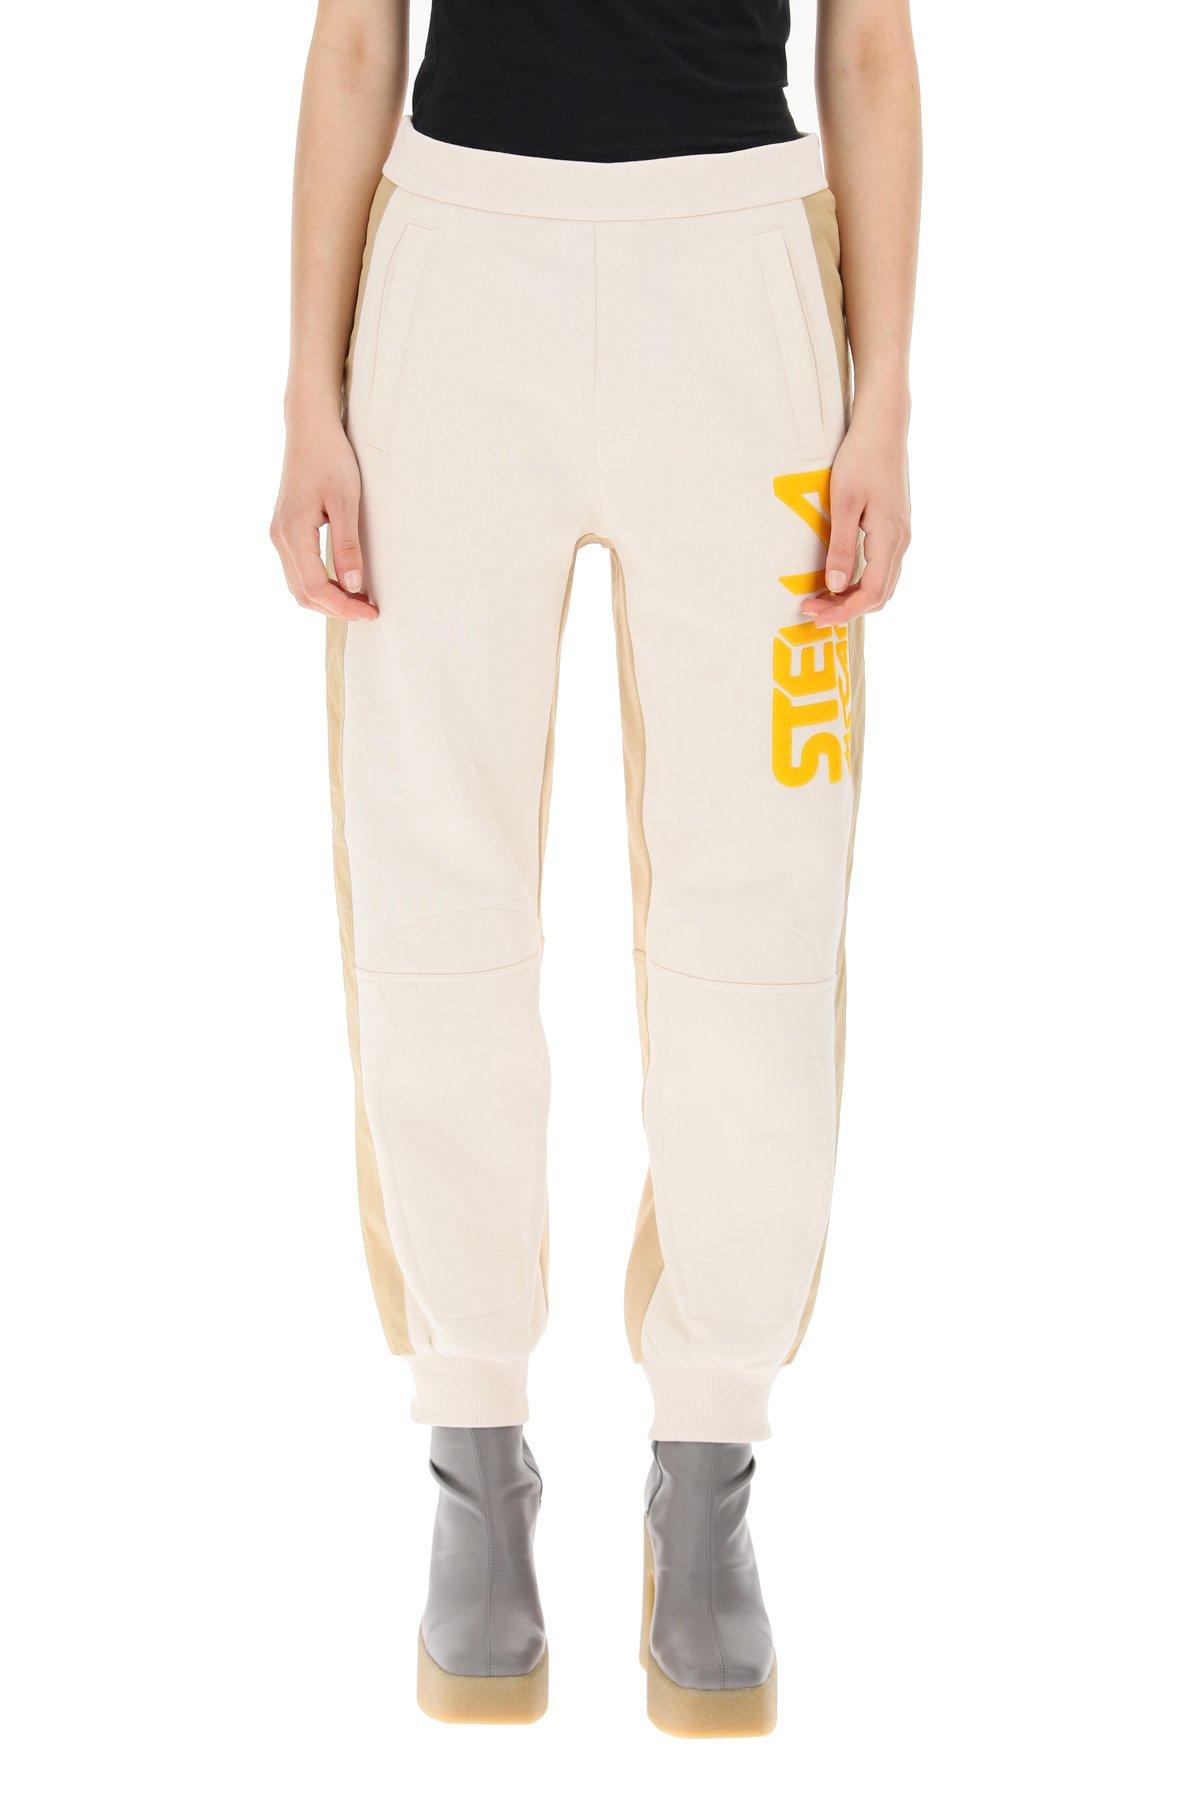 Stella mccartney pantaloni jogger con logo